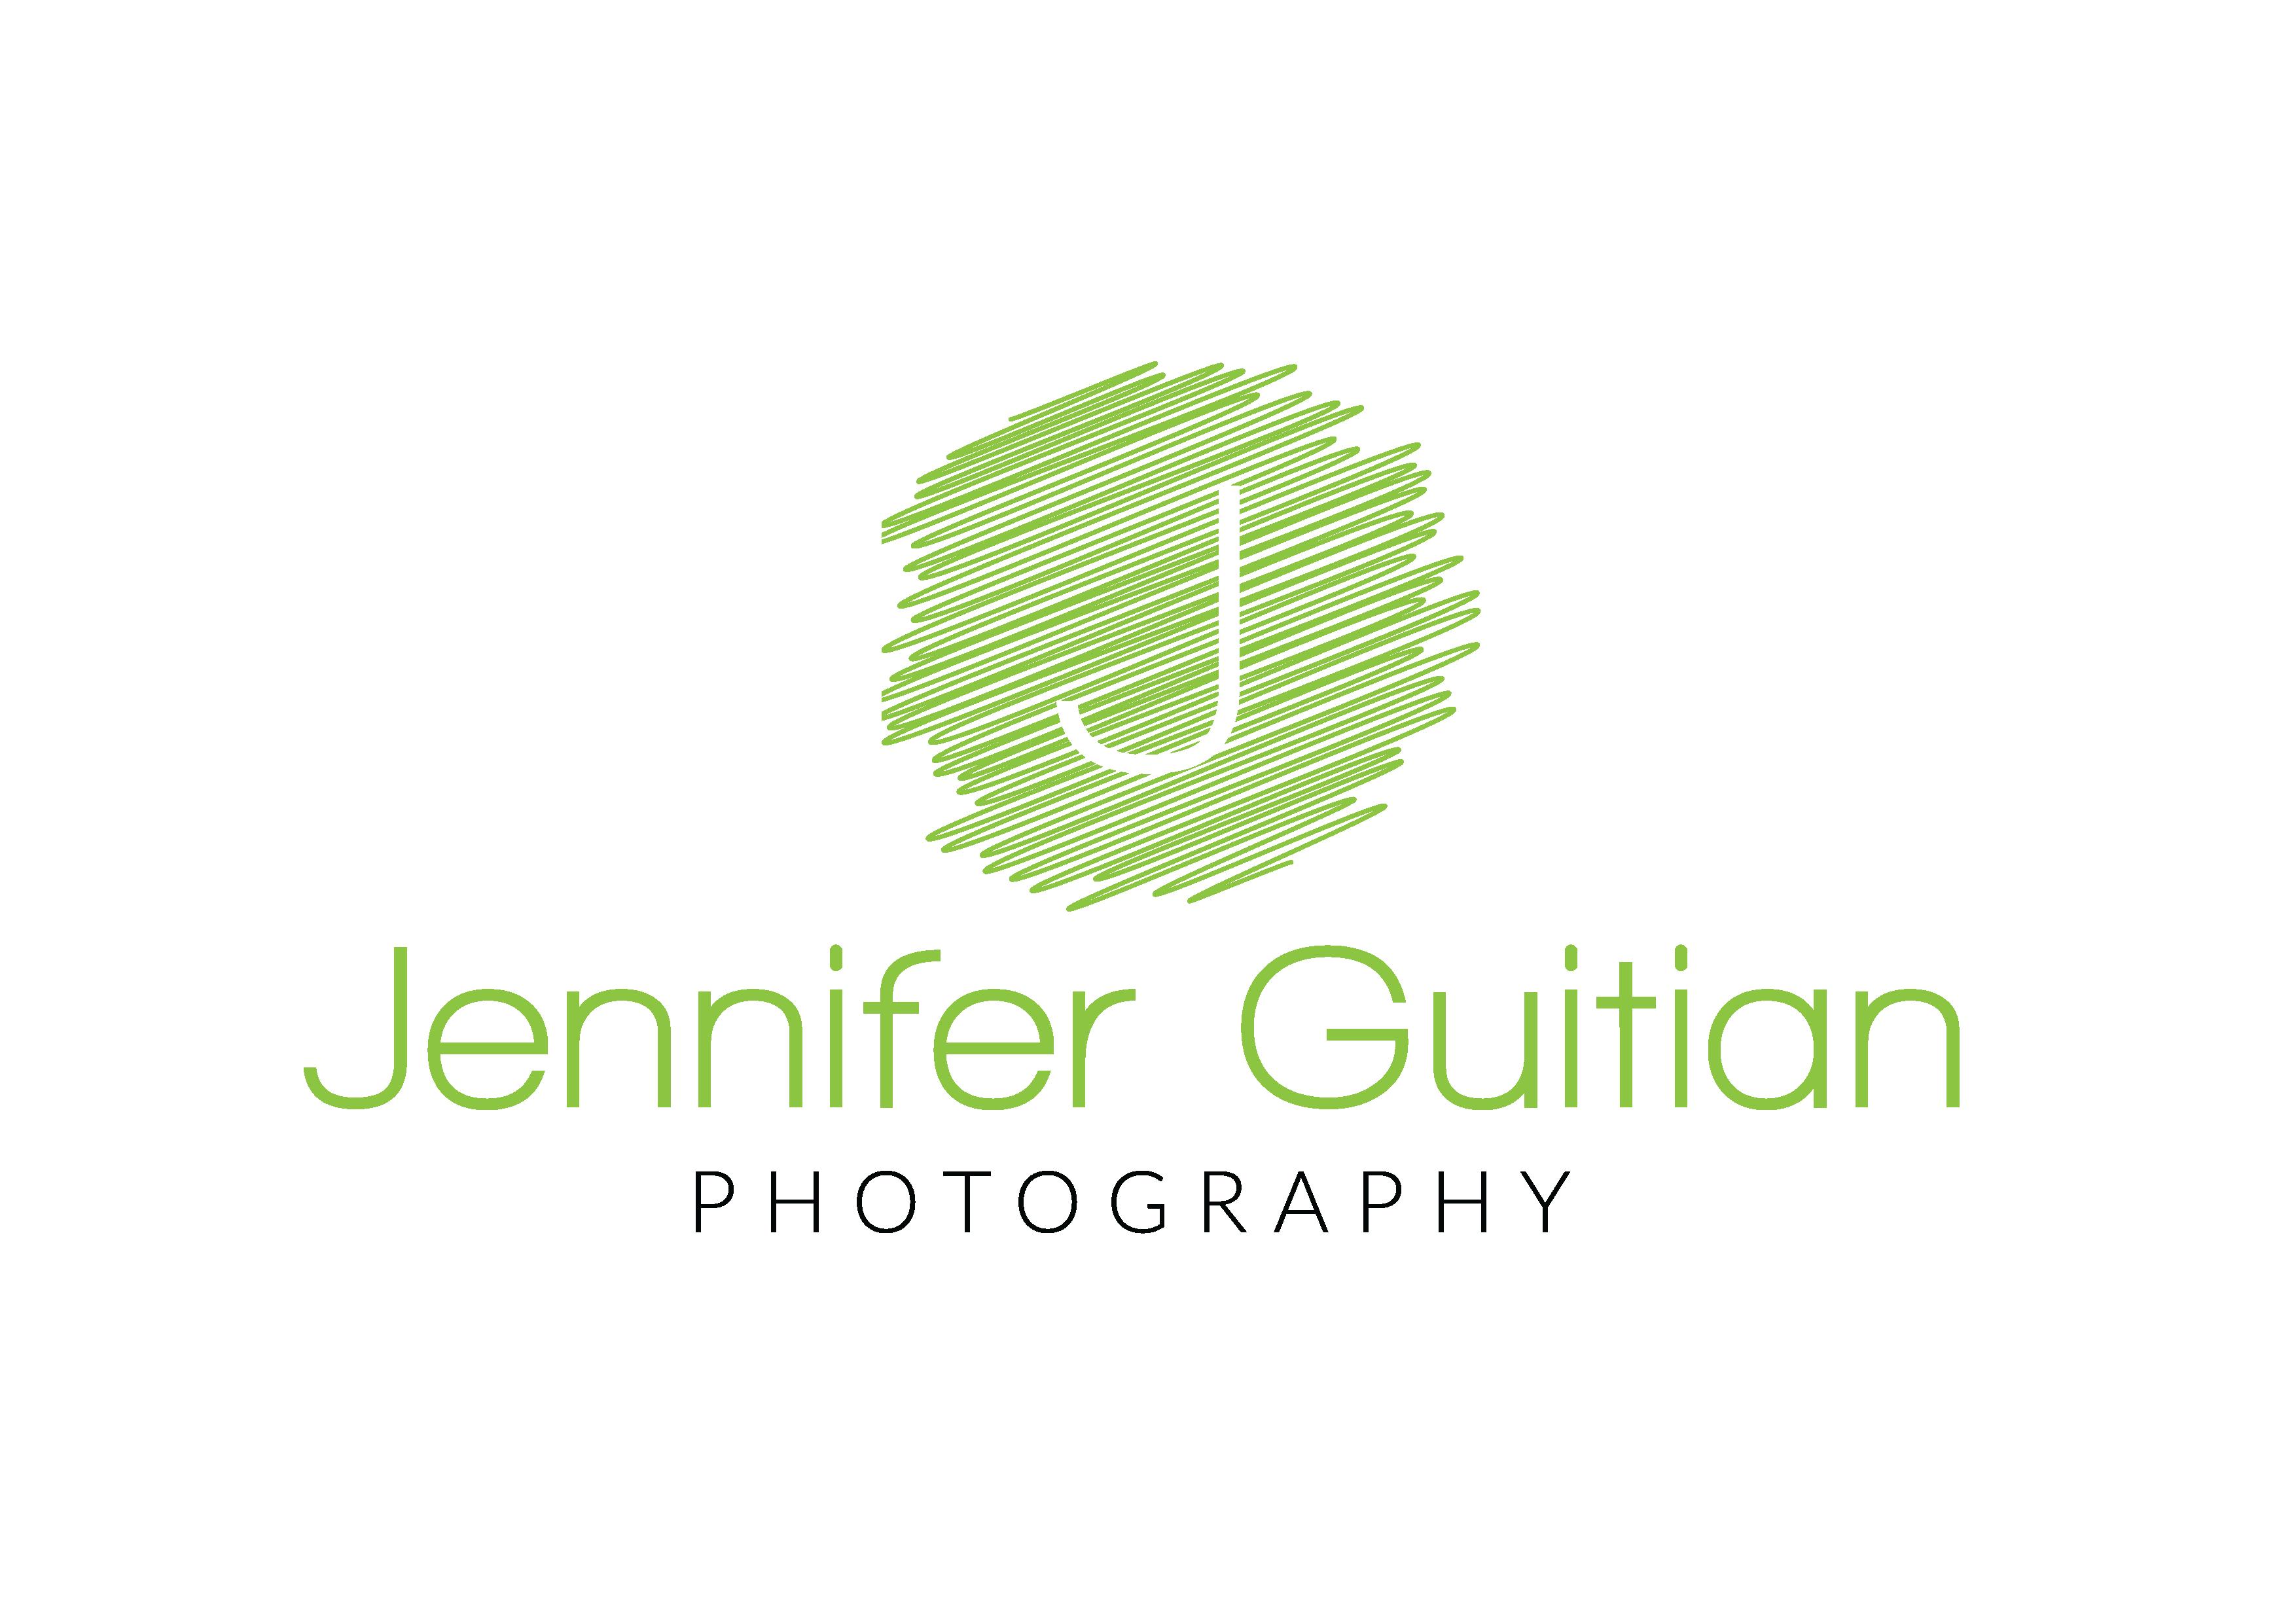 Jennifer Guitian